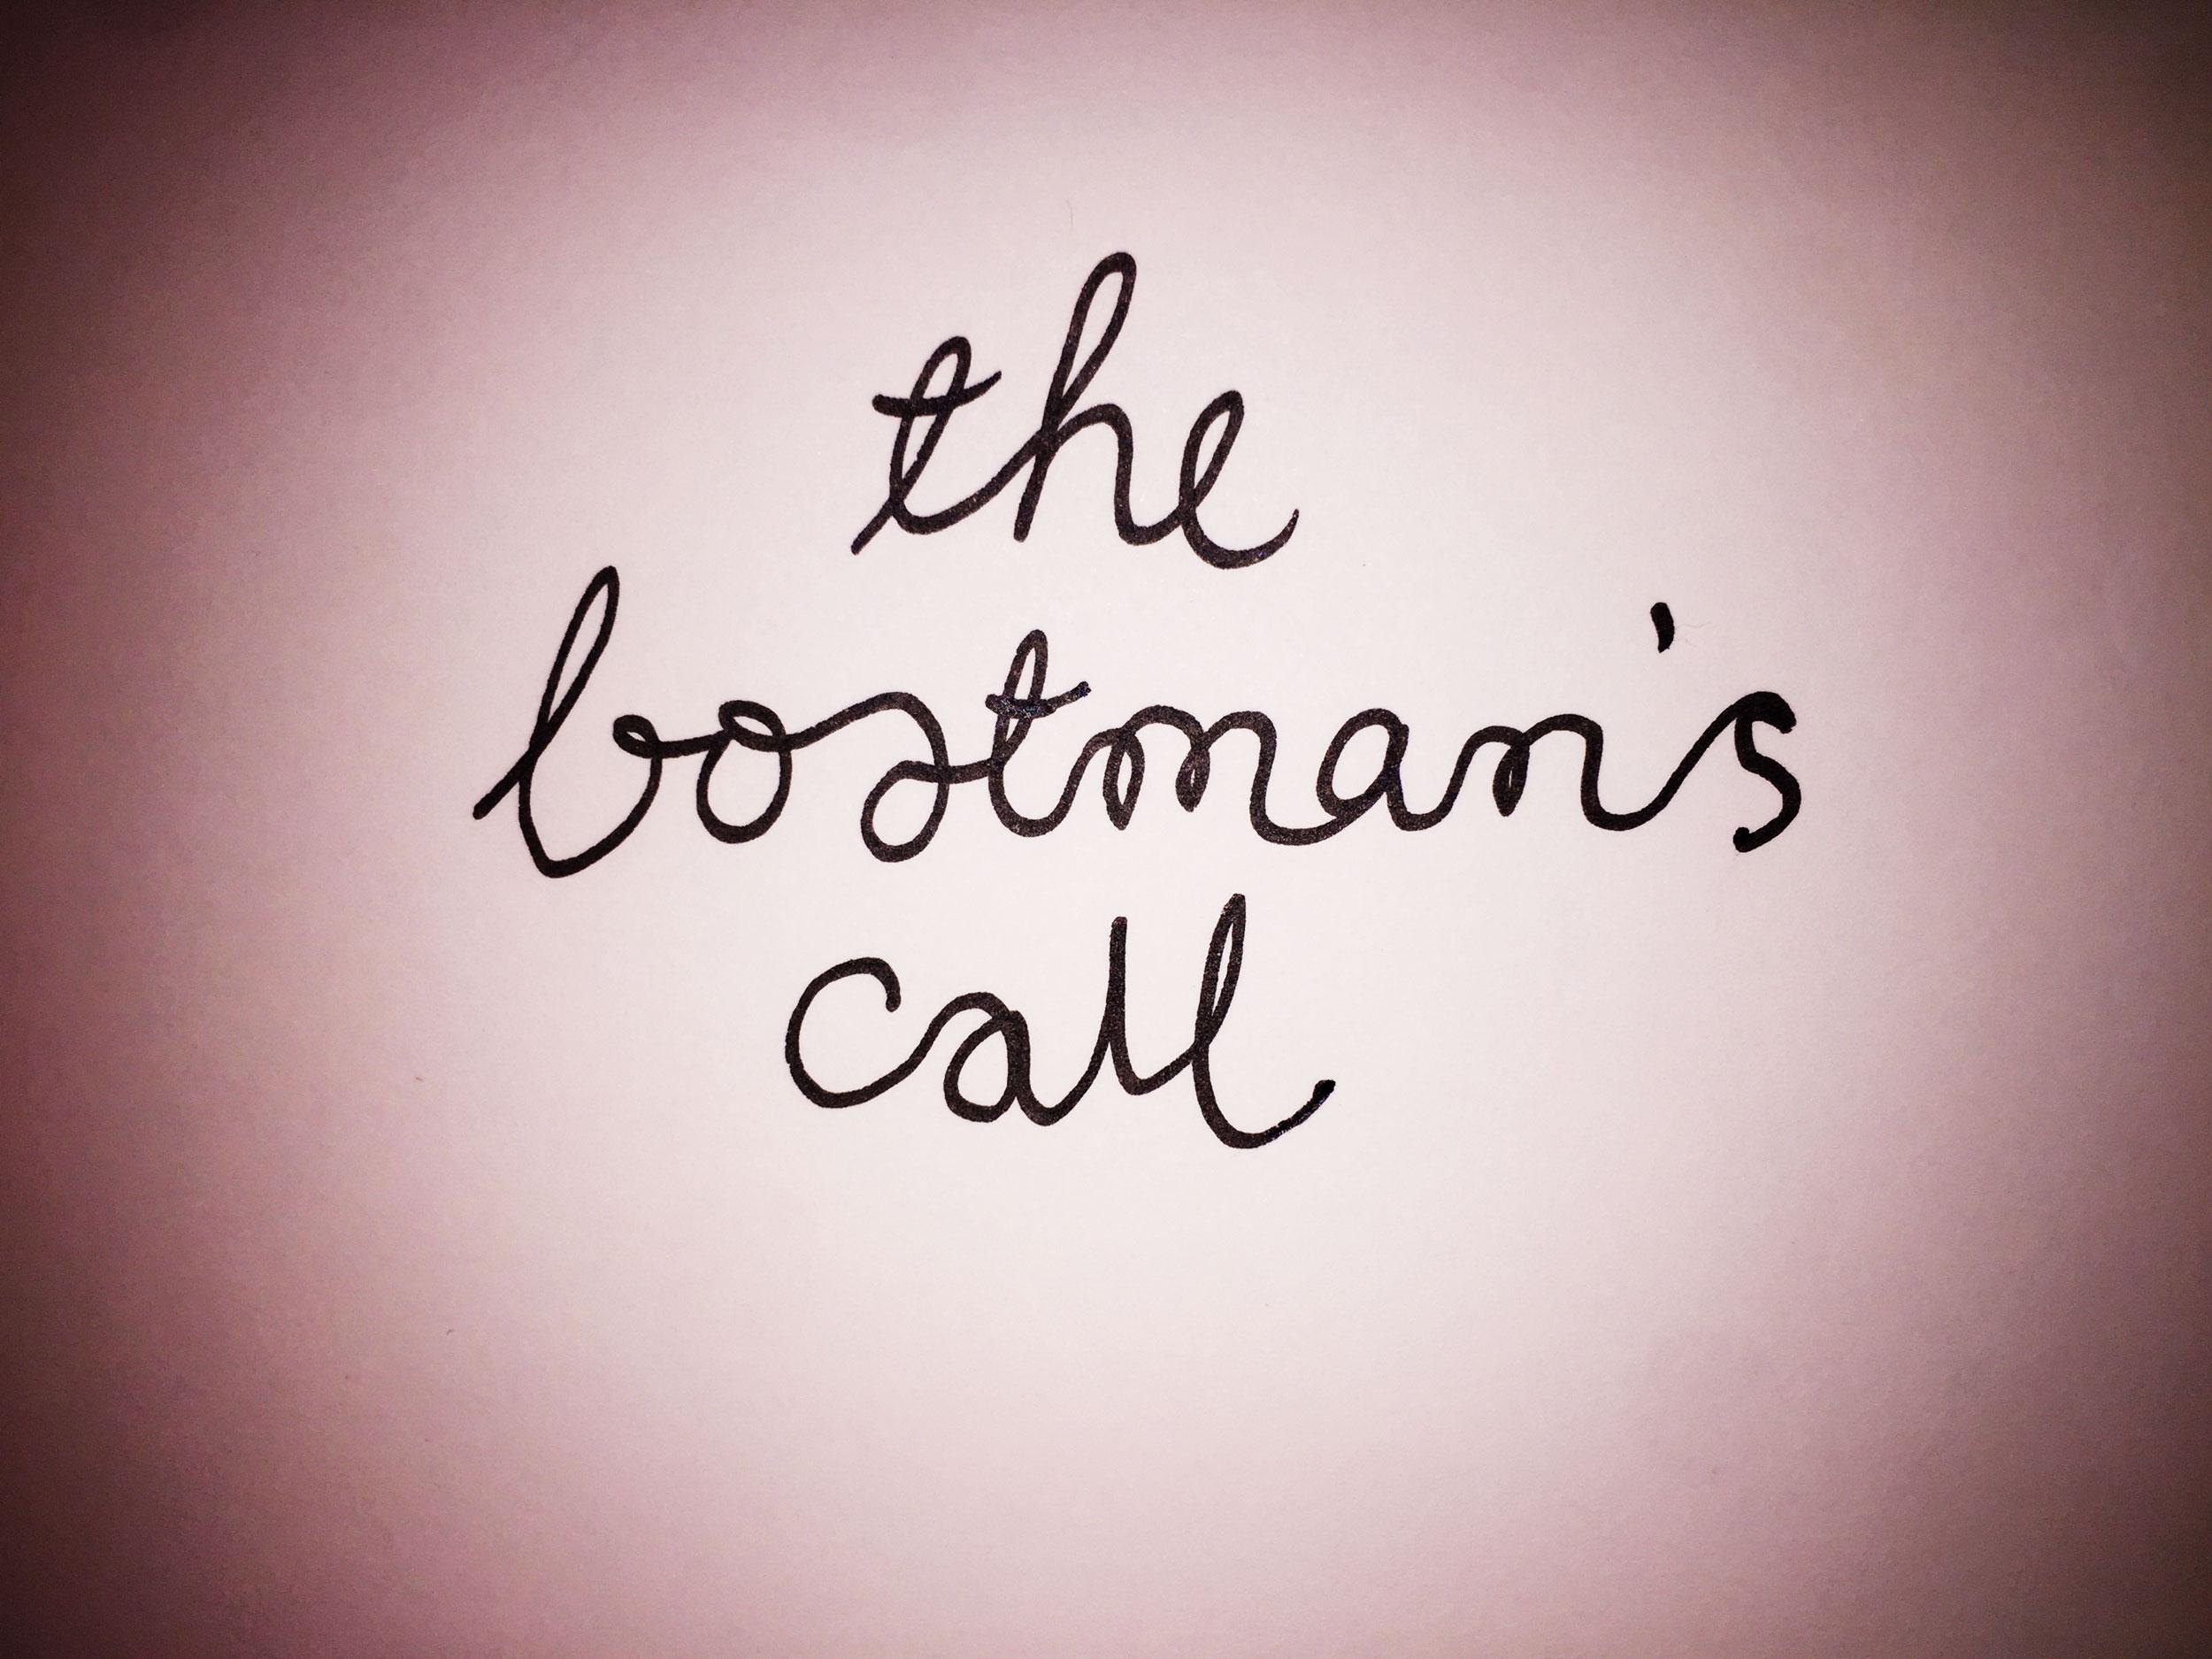 The boatman's call. Drawing Luke Hockley.